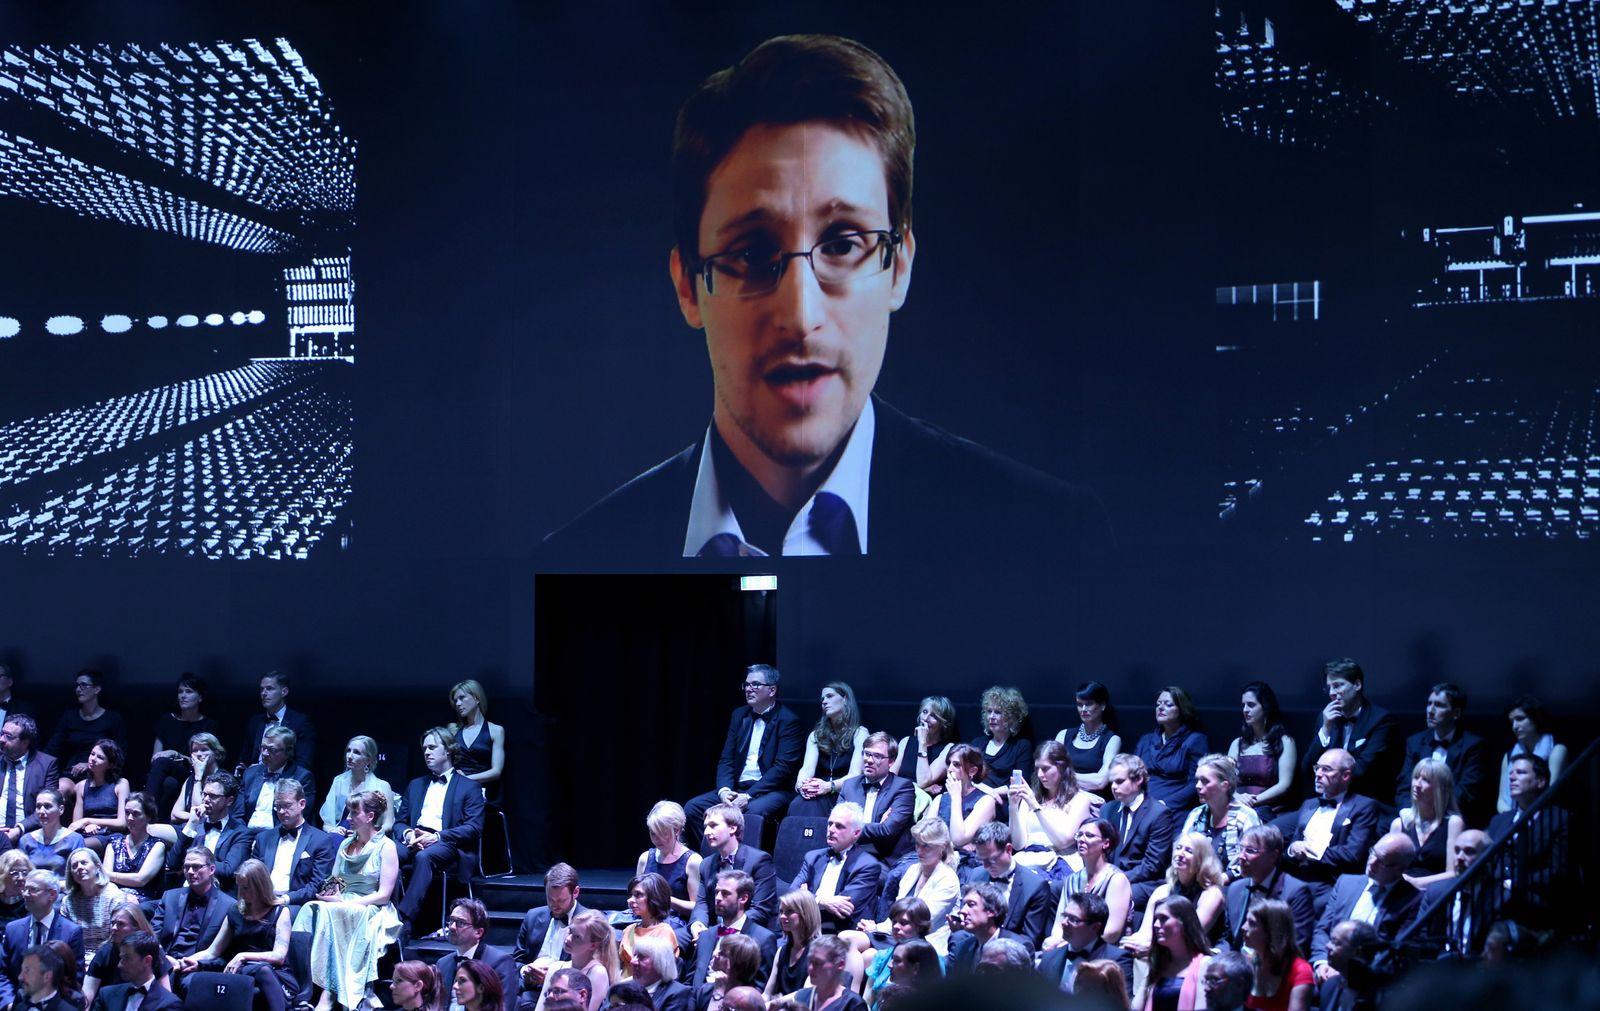 Edward Snowden - Henri Nannen Preisverleihung